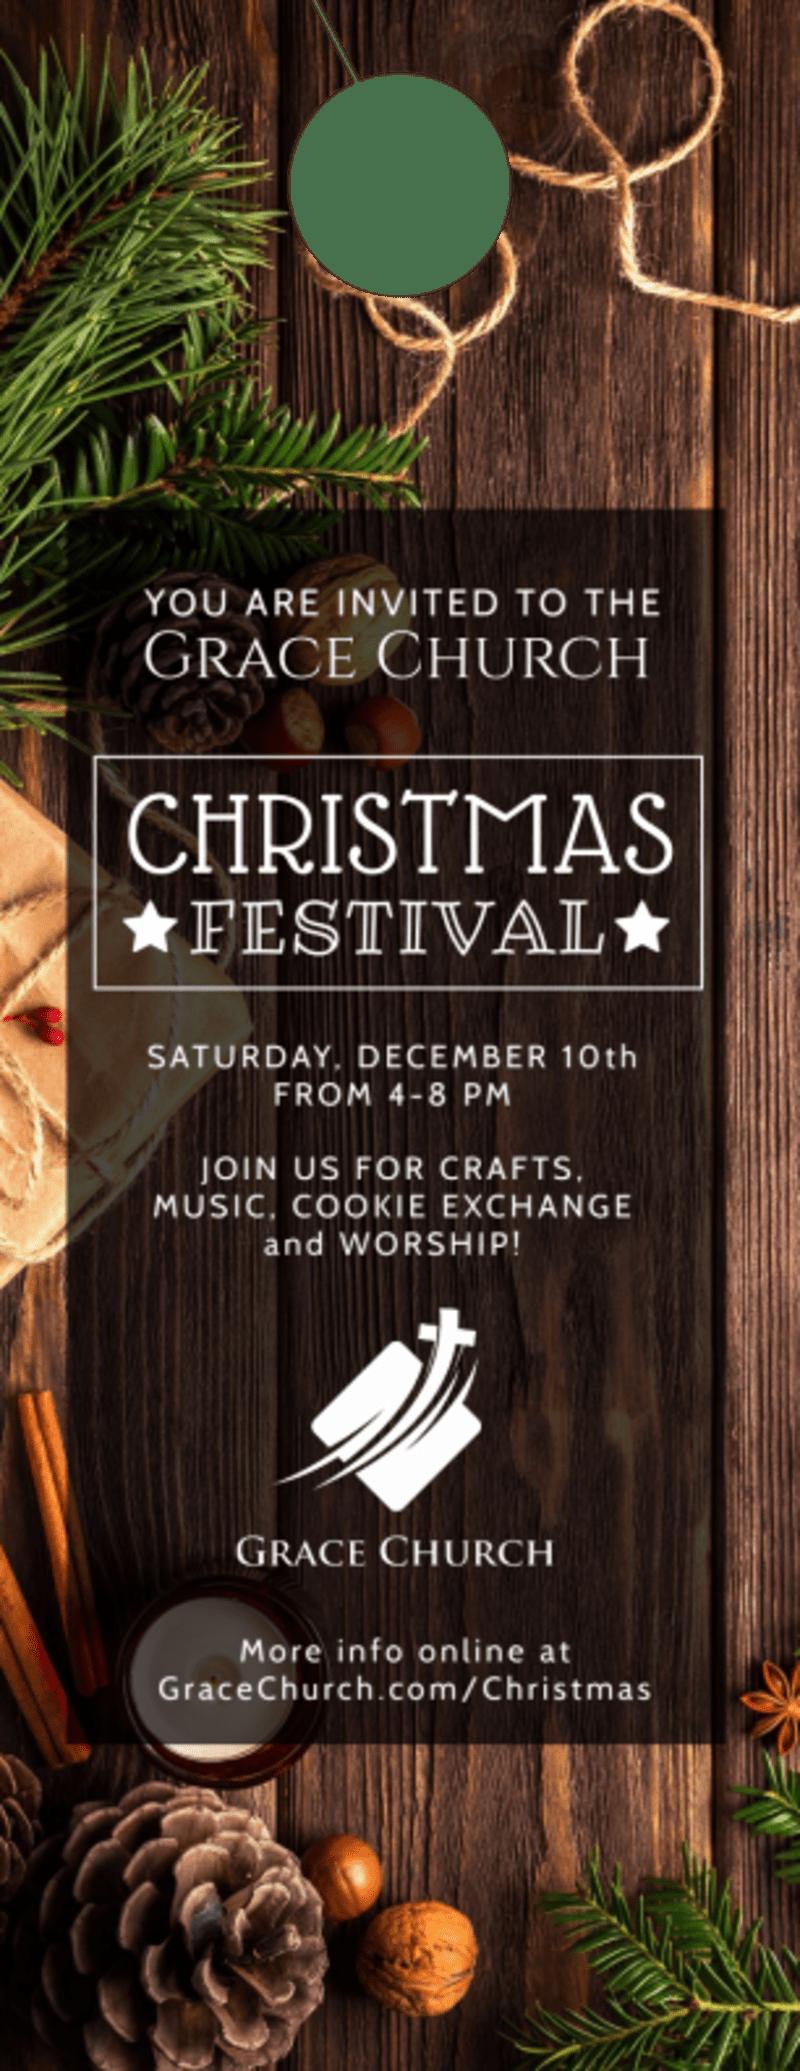 Church Christmas Festival Door Hanger Template Preview 2